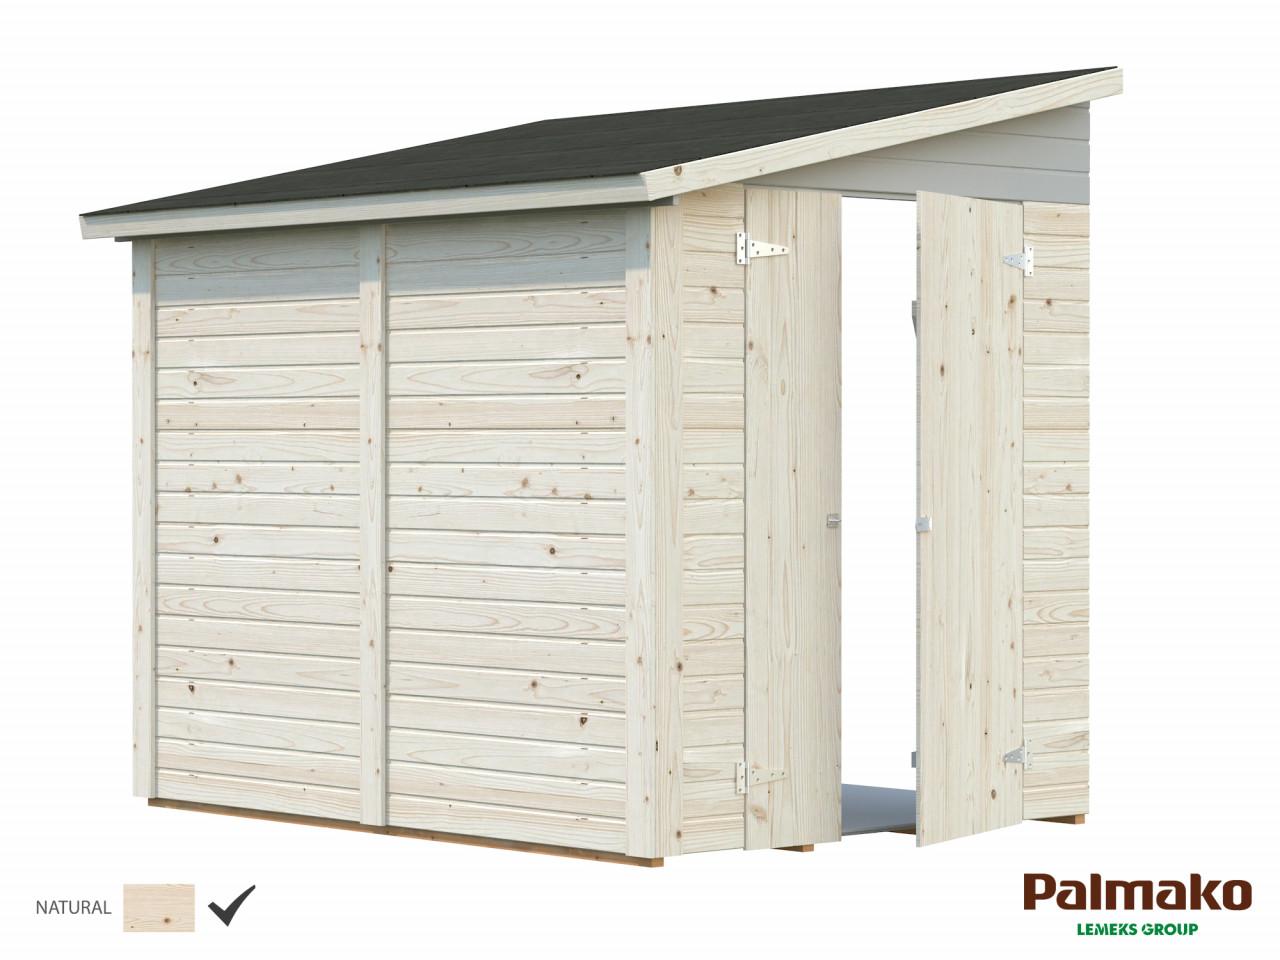 Palmako Gerätehaus Mia 3,6 m²